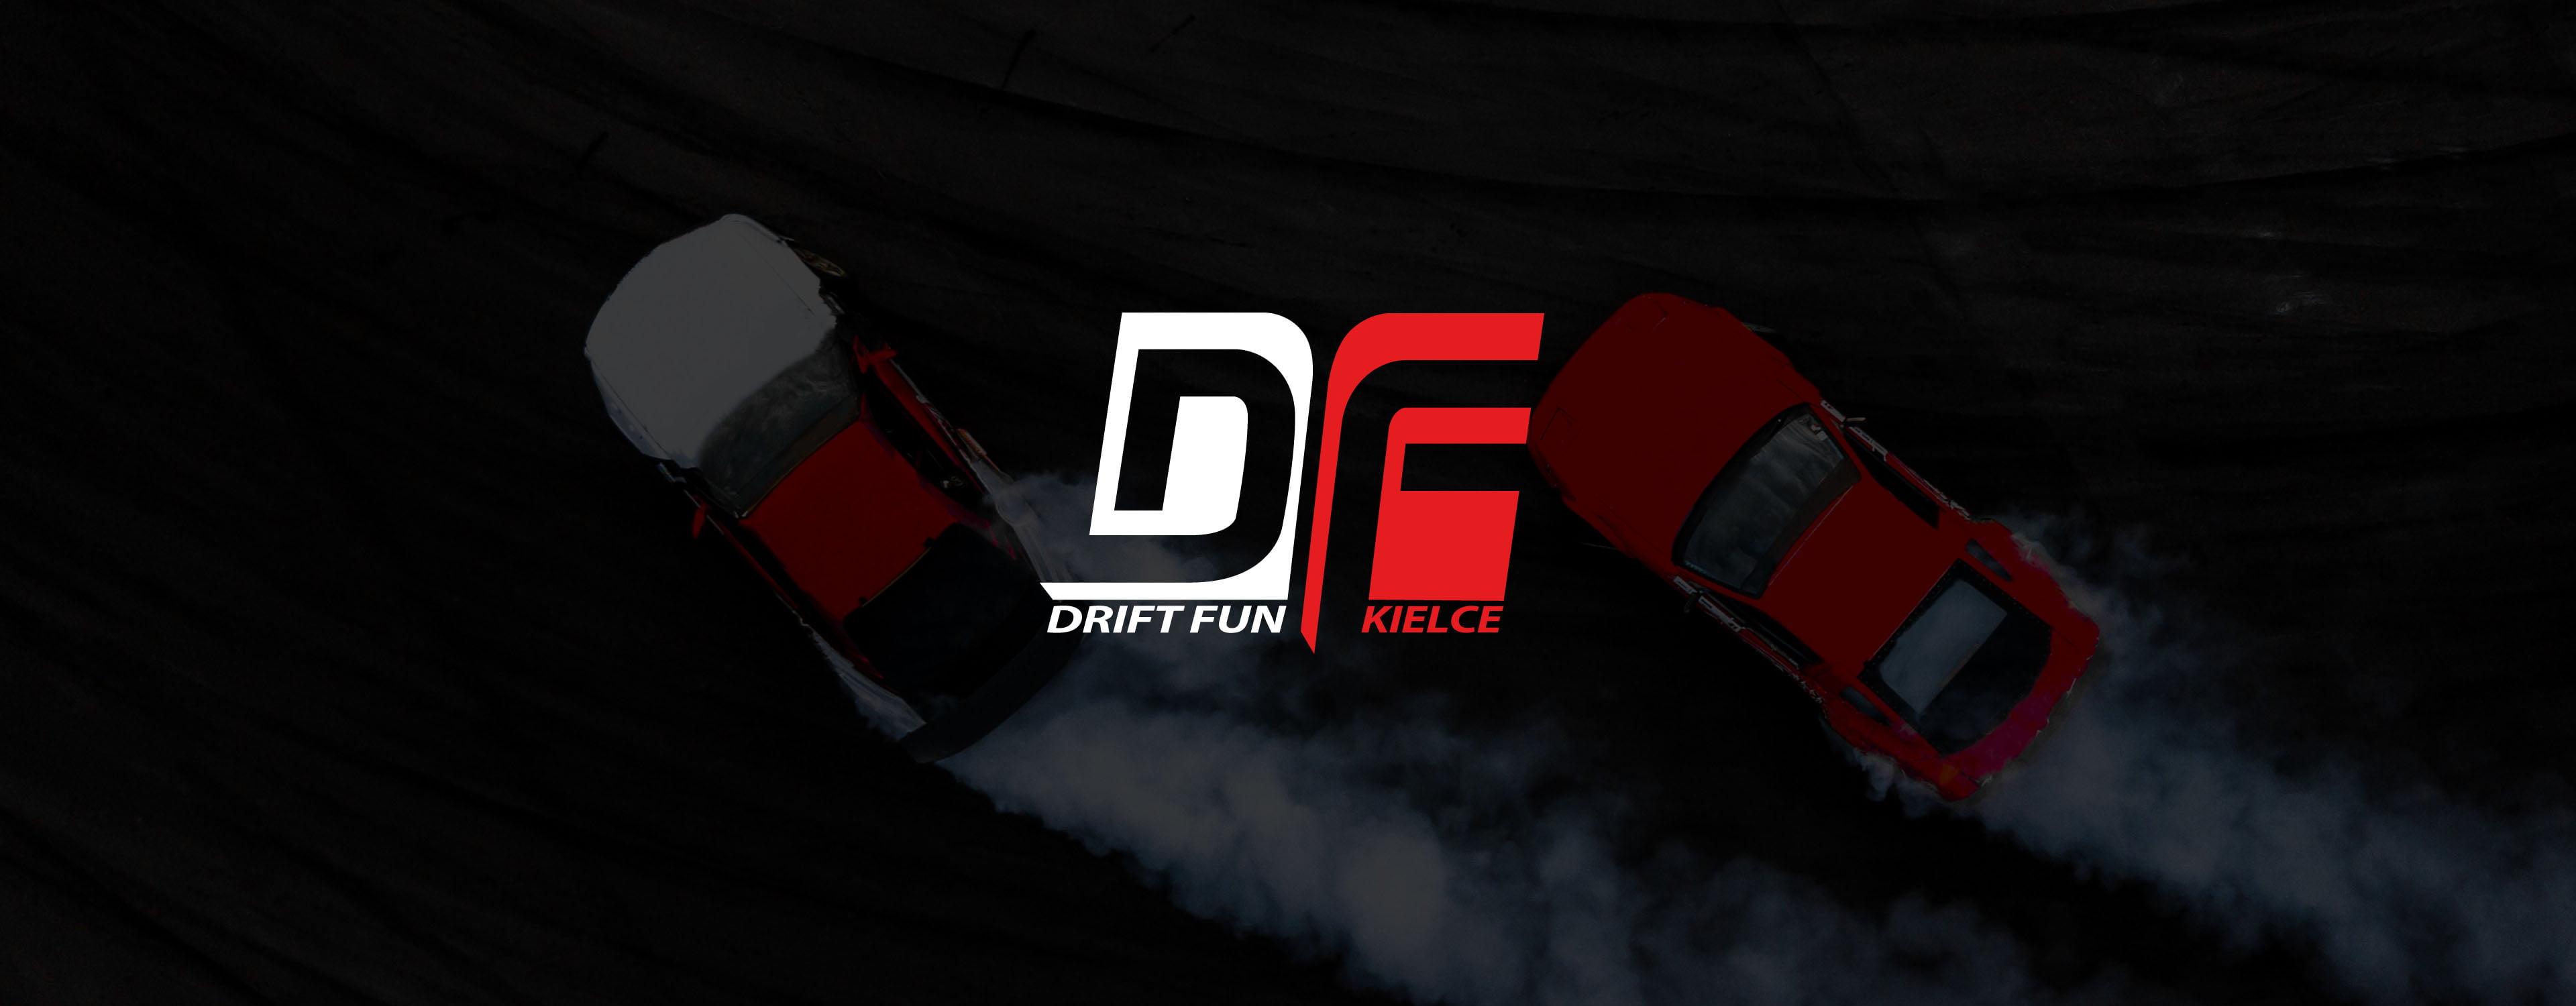 Projekt Drift Fun Sto15 Studio Piotr Ratuski